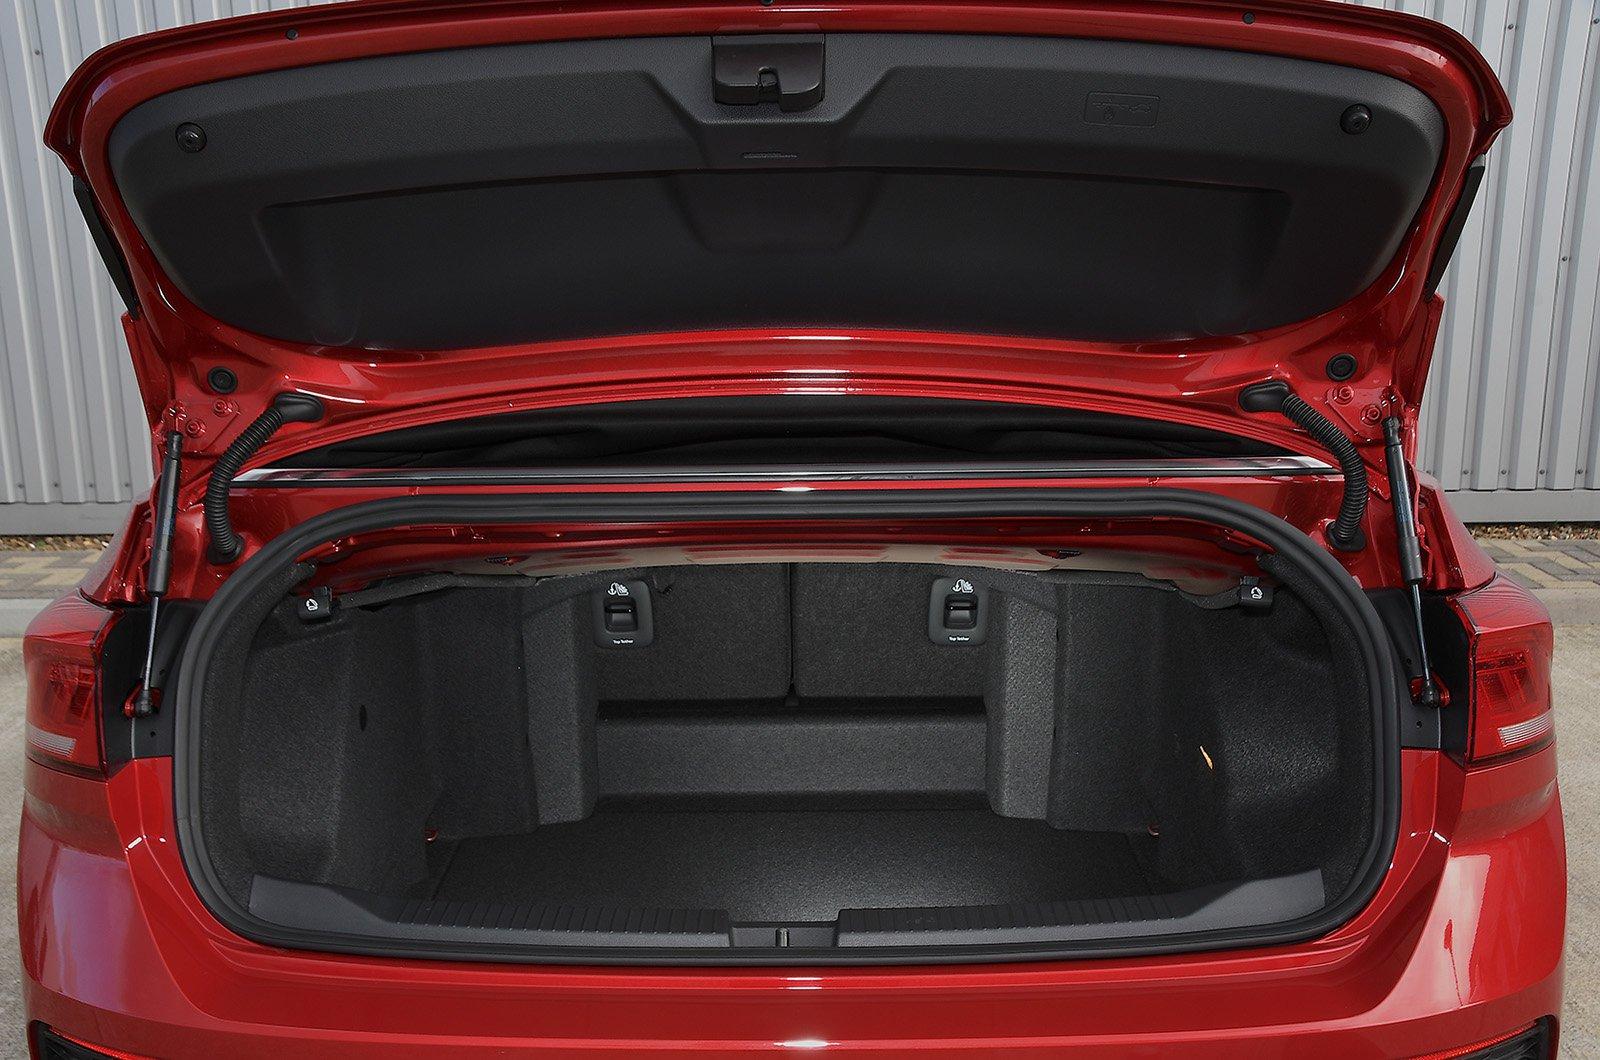 2020 Volkswagen T-Roc Cabriolet 1.5 TSI Design boot